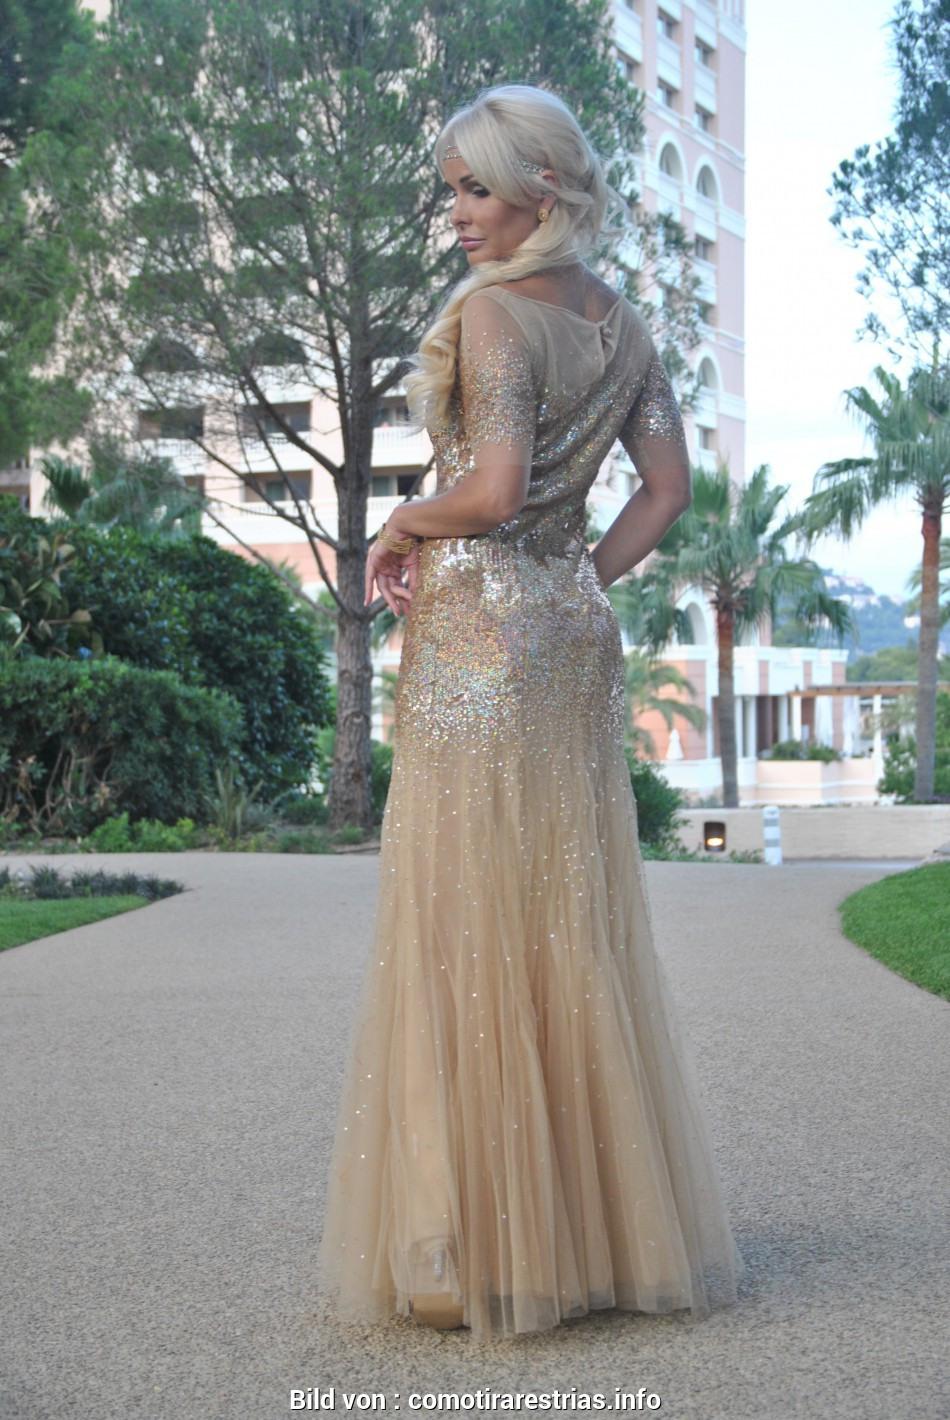 13 Elegant Abendkleider Verleih Berlin Spezialgebiet15 Schön Abendkleider Verleih Berlin für 2019